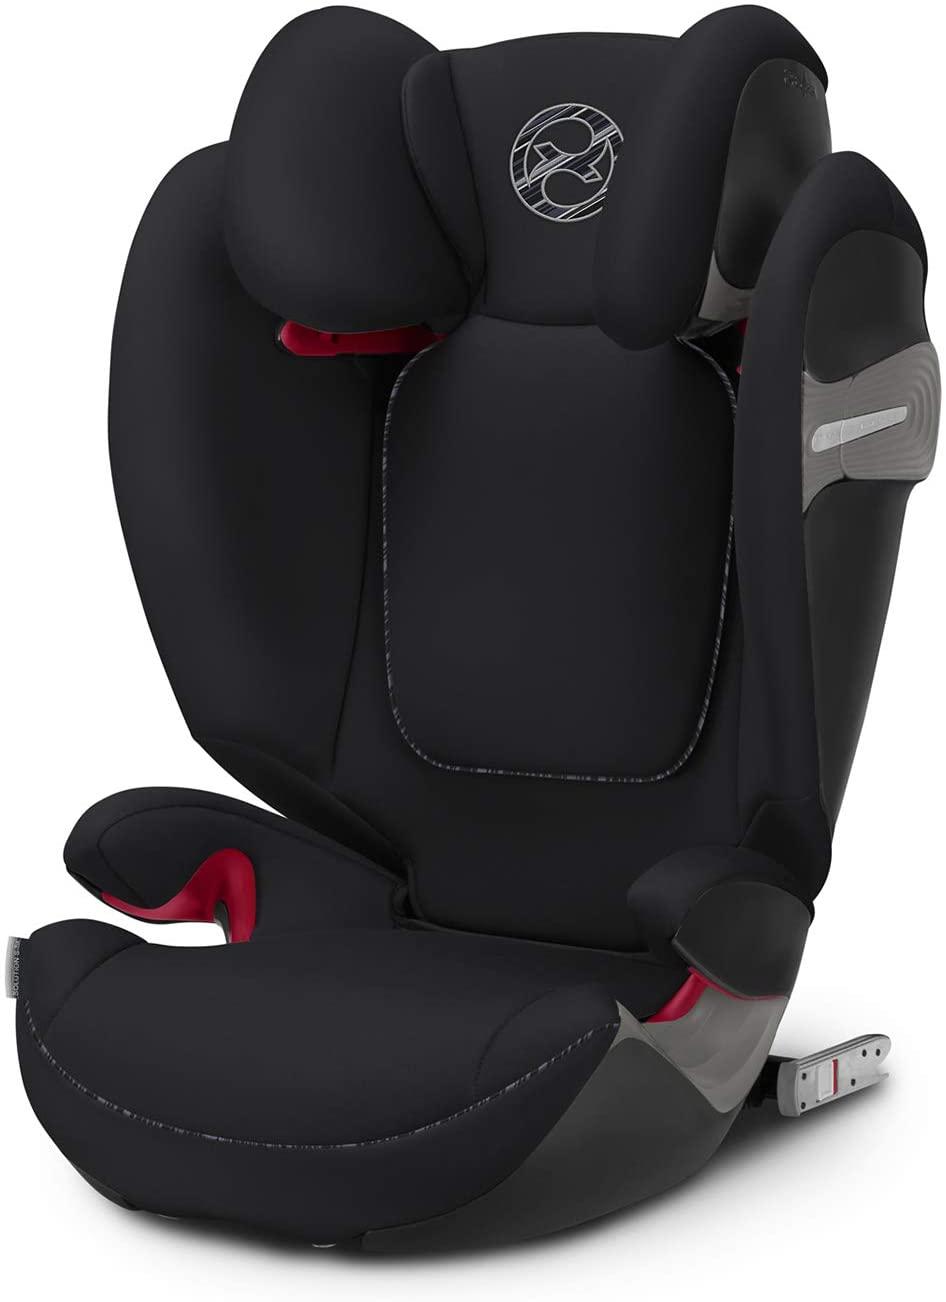 Cybex Gold Solution S-Fix Child's Car Seat Group 2/3 Urban Black - £115 @ Amazon